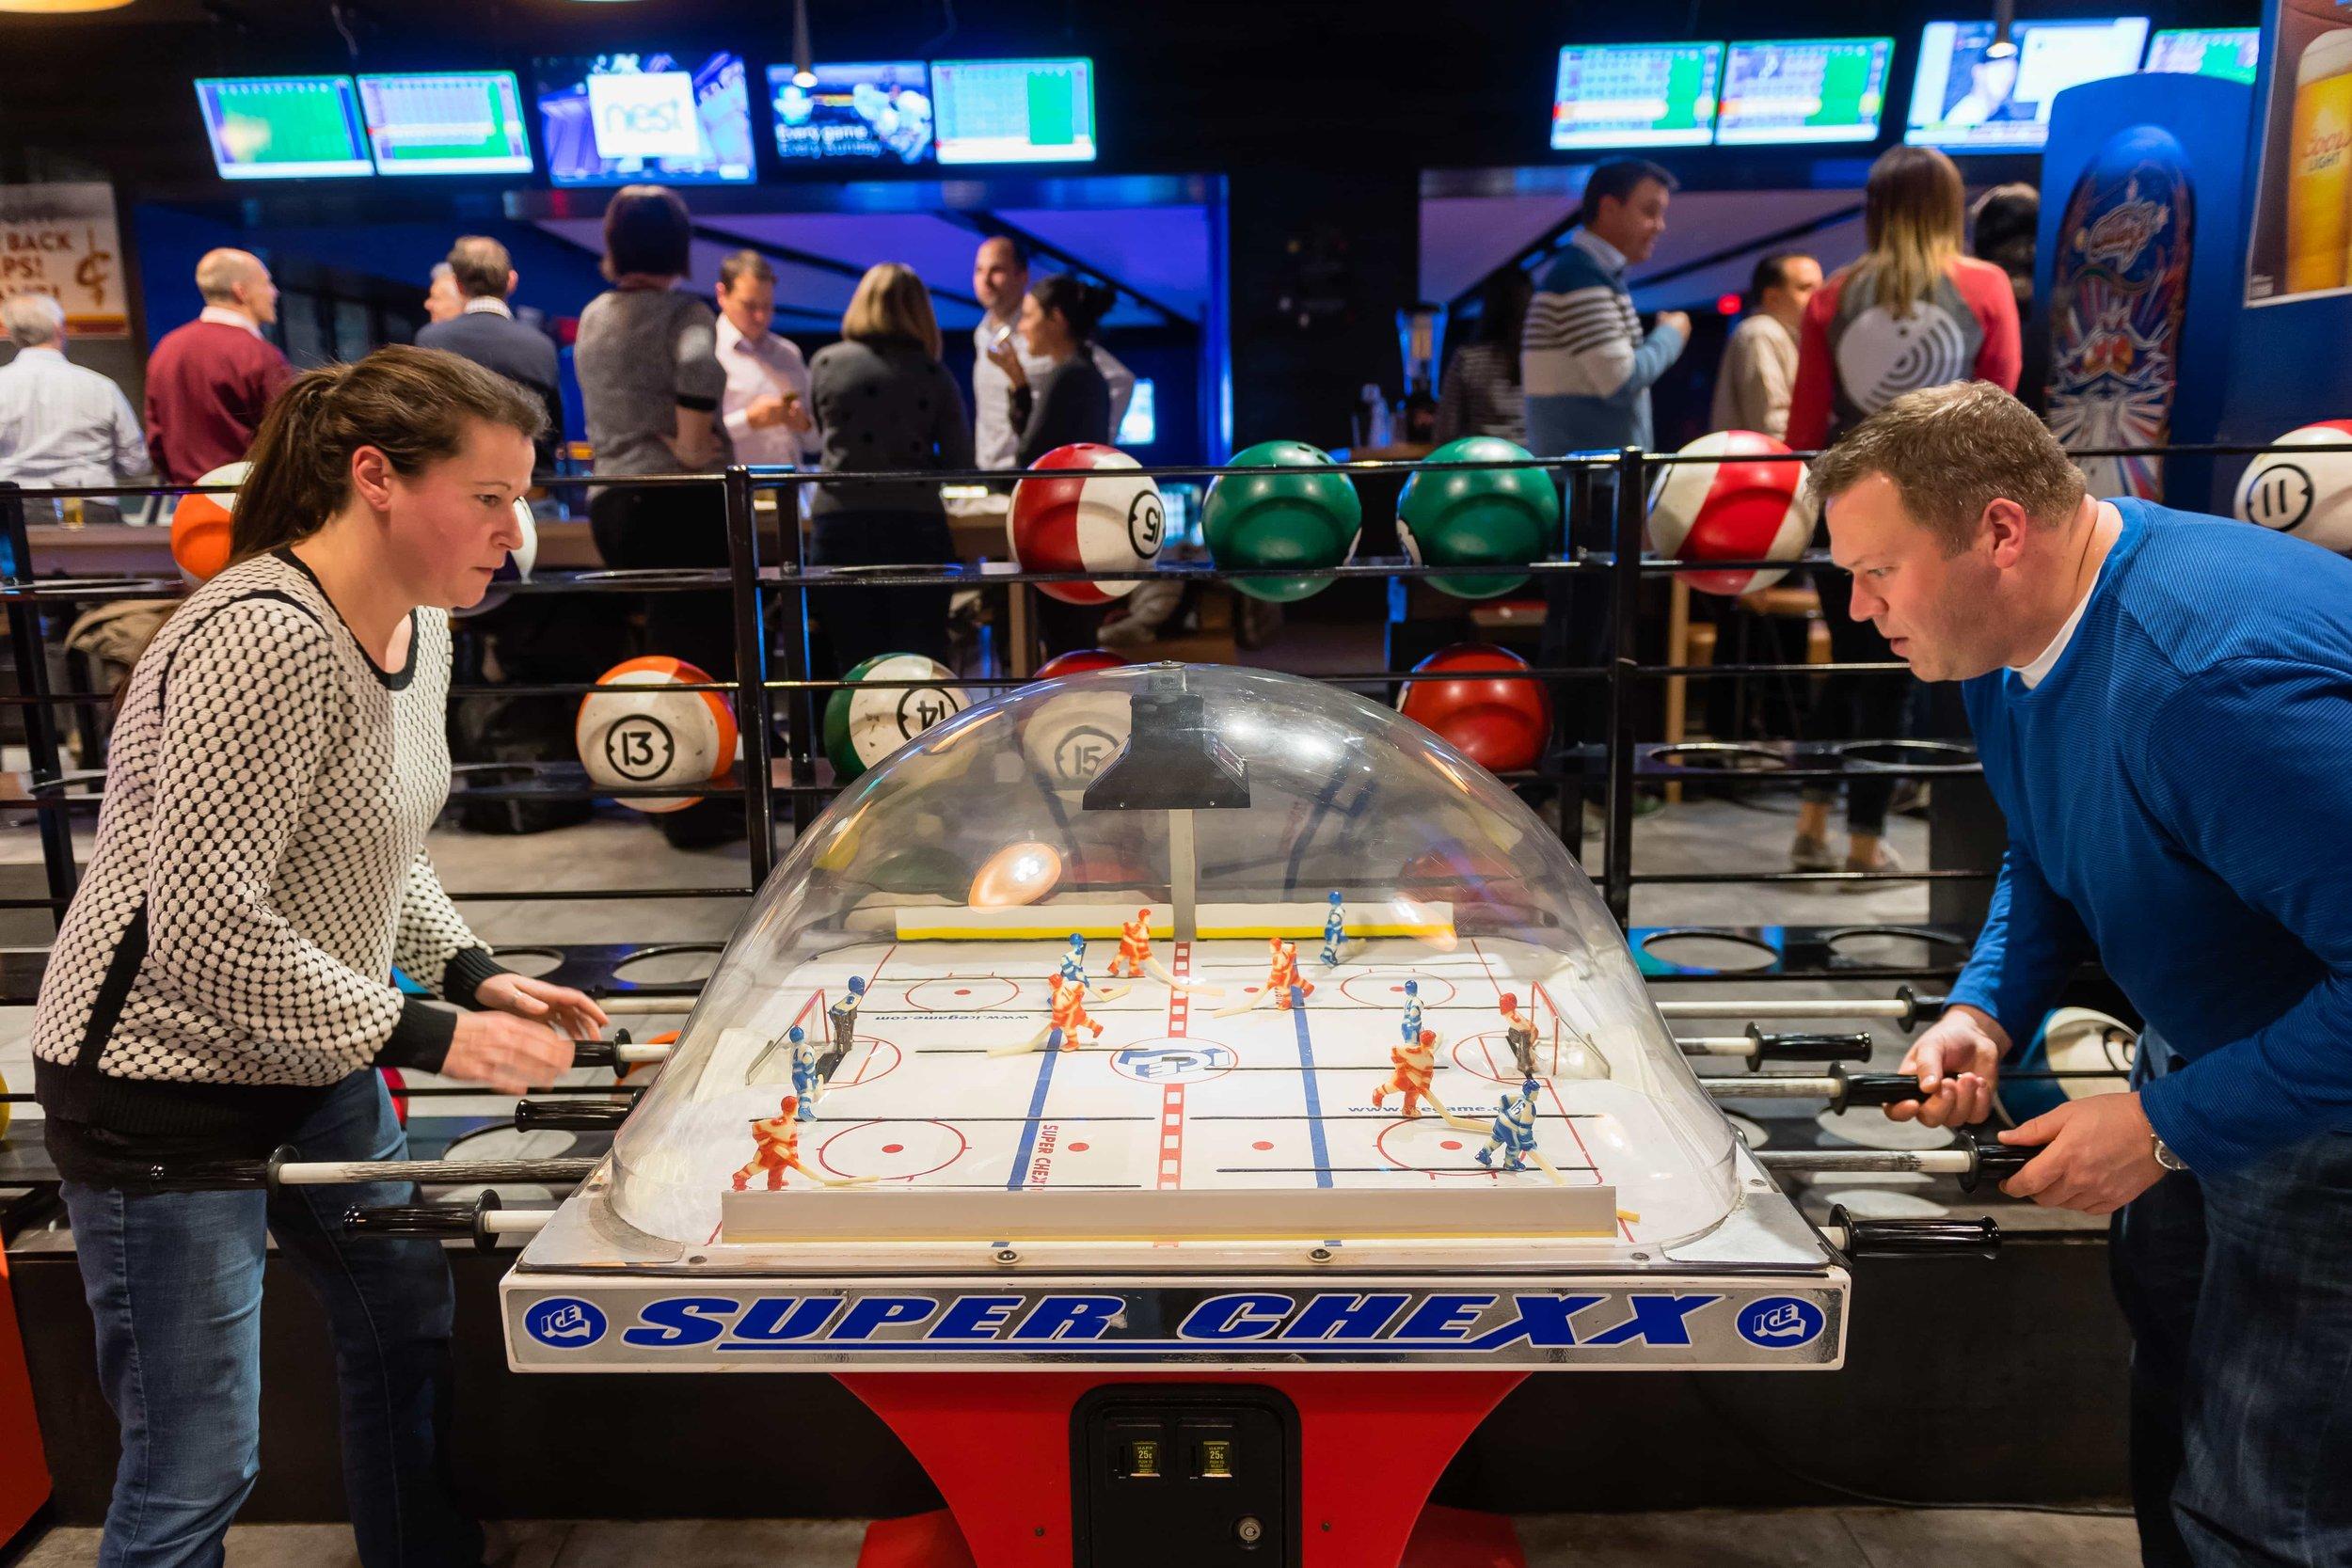 games-bubble-hockey-intense.jpg